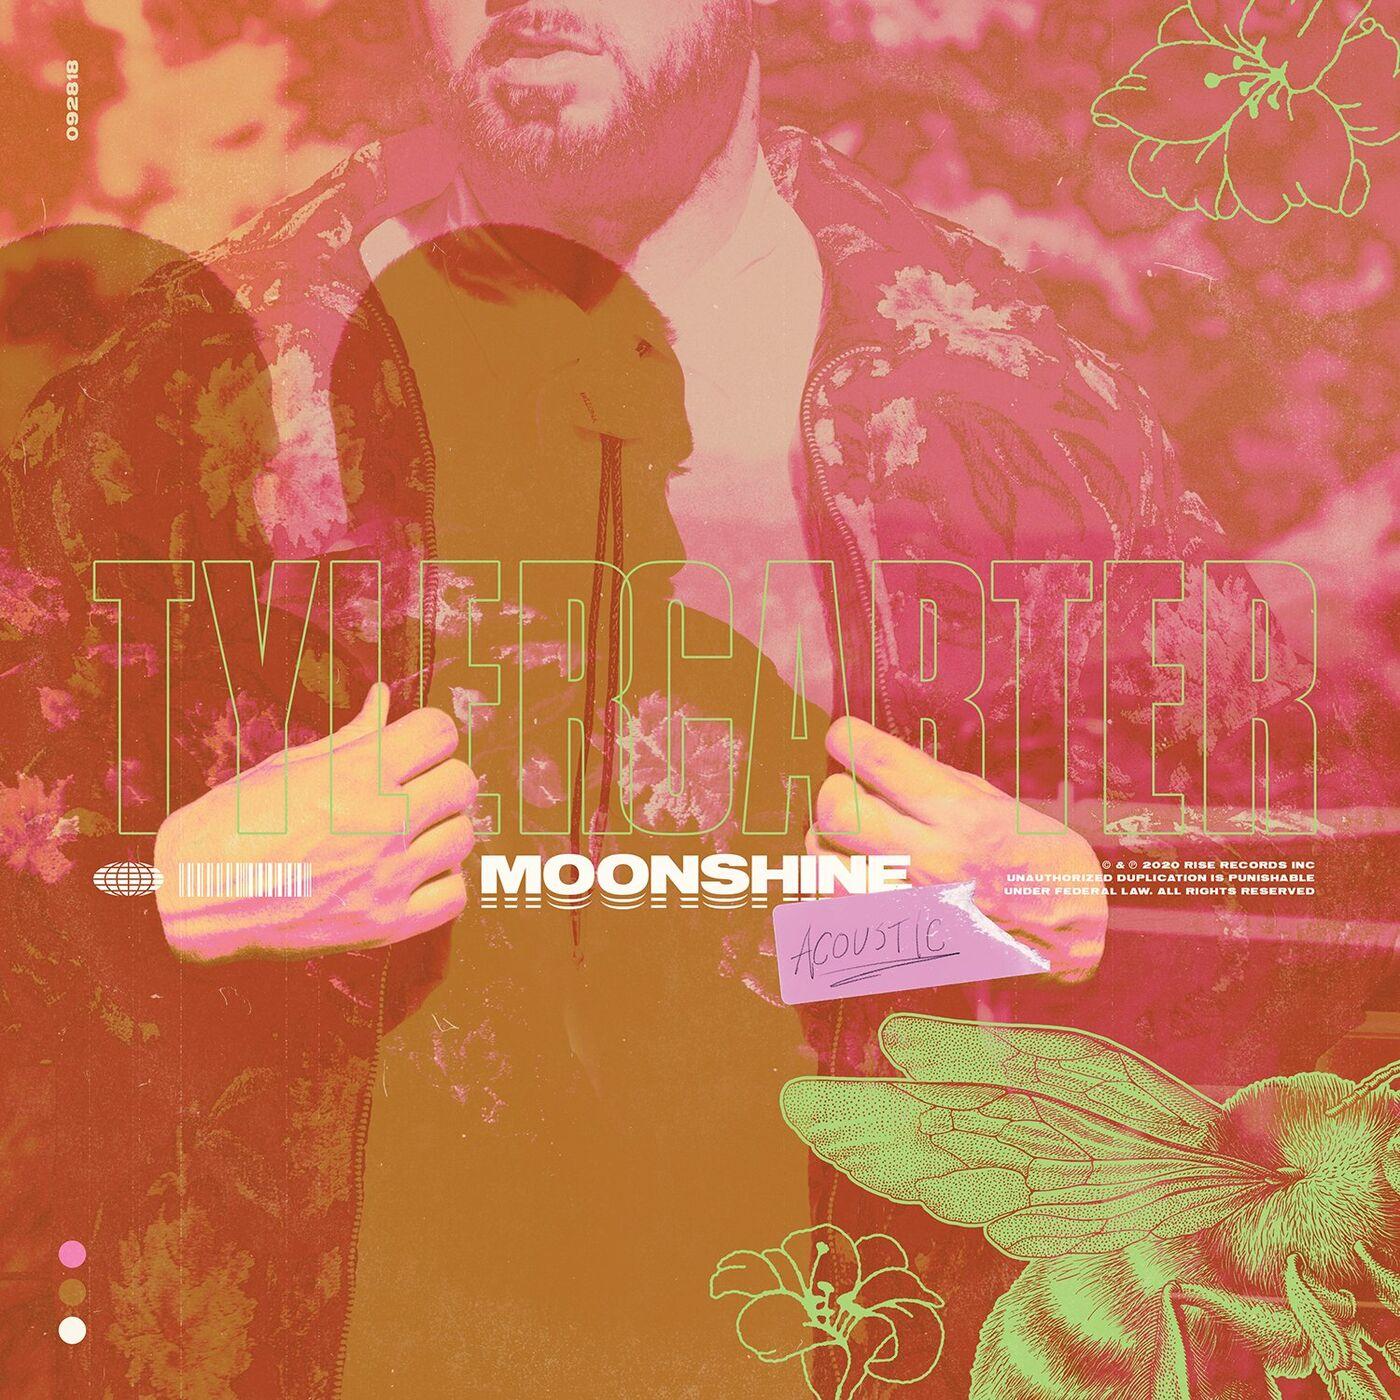 Tyler Carter - Moonshine Acoustic (2020)